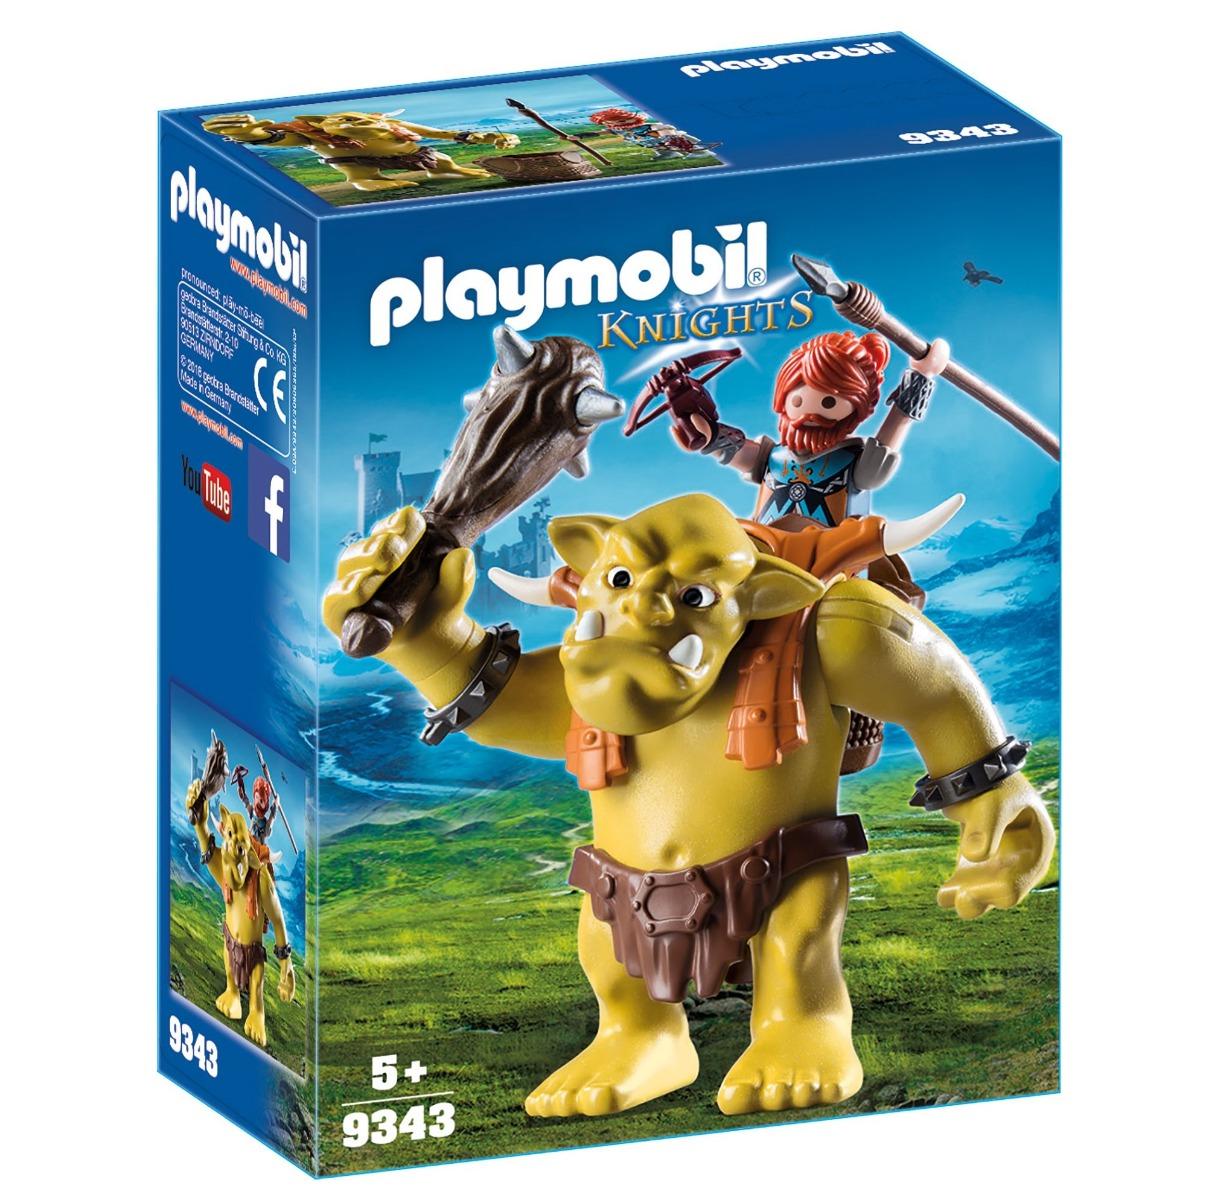 Playmobil PM9343 Trol Cu Luptator Pitic imagine hippoland.ro